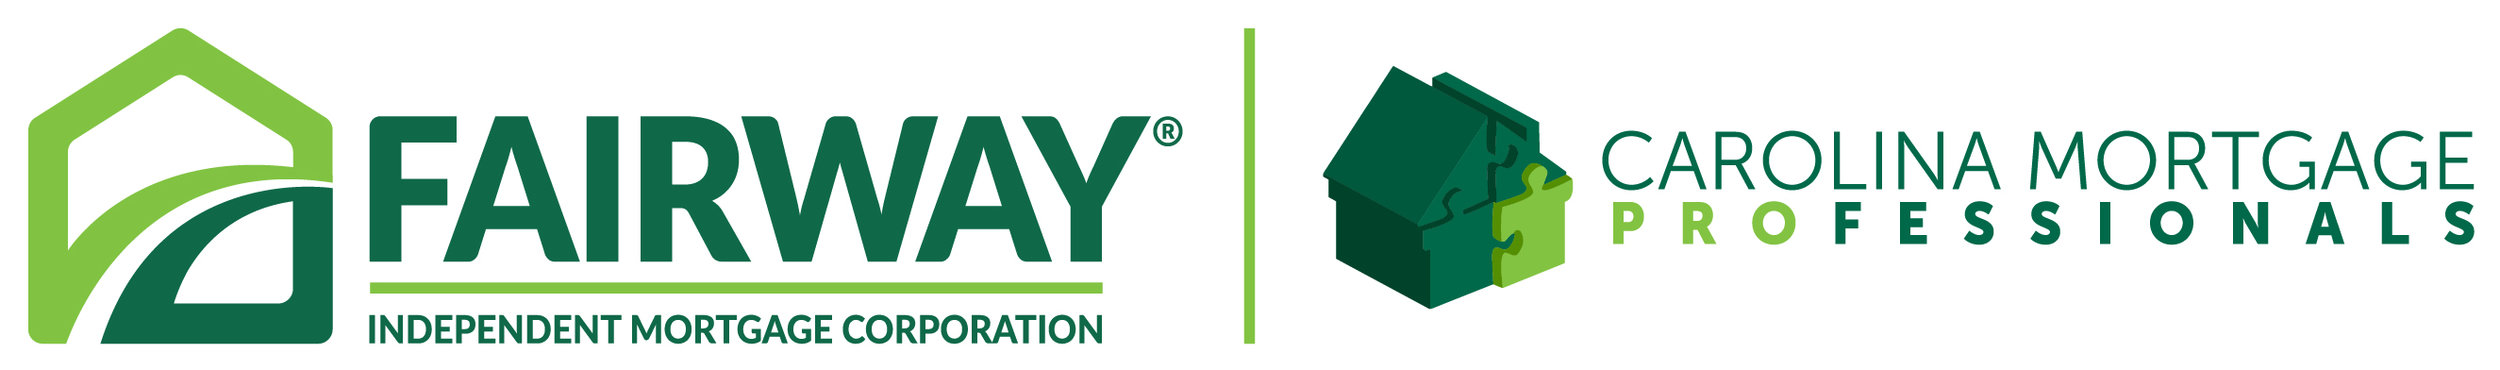 1376935_Carolina_Mortgage_Professionals_Team_Logo_Horizontal.jpg